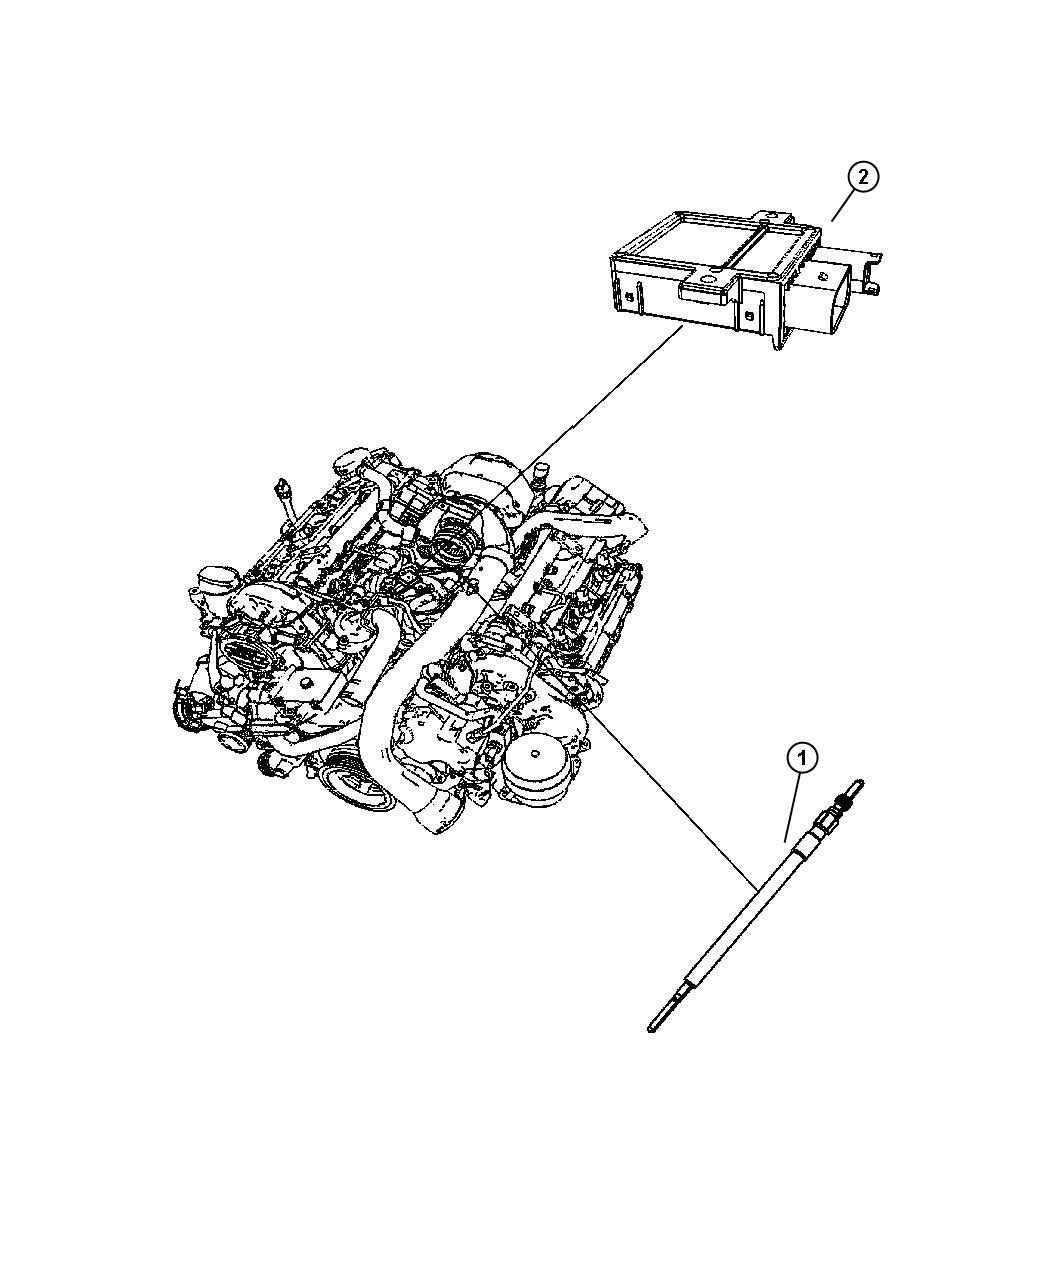 Jeep Grand Cherokee Glow Plug Plugs Sensors Electrical